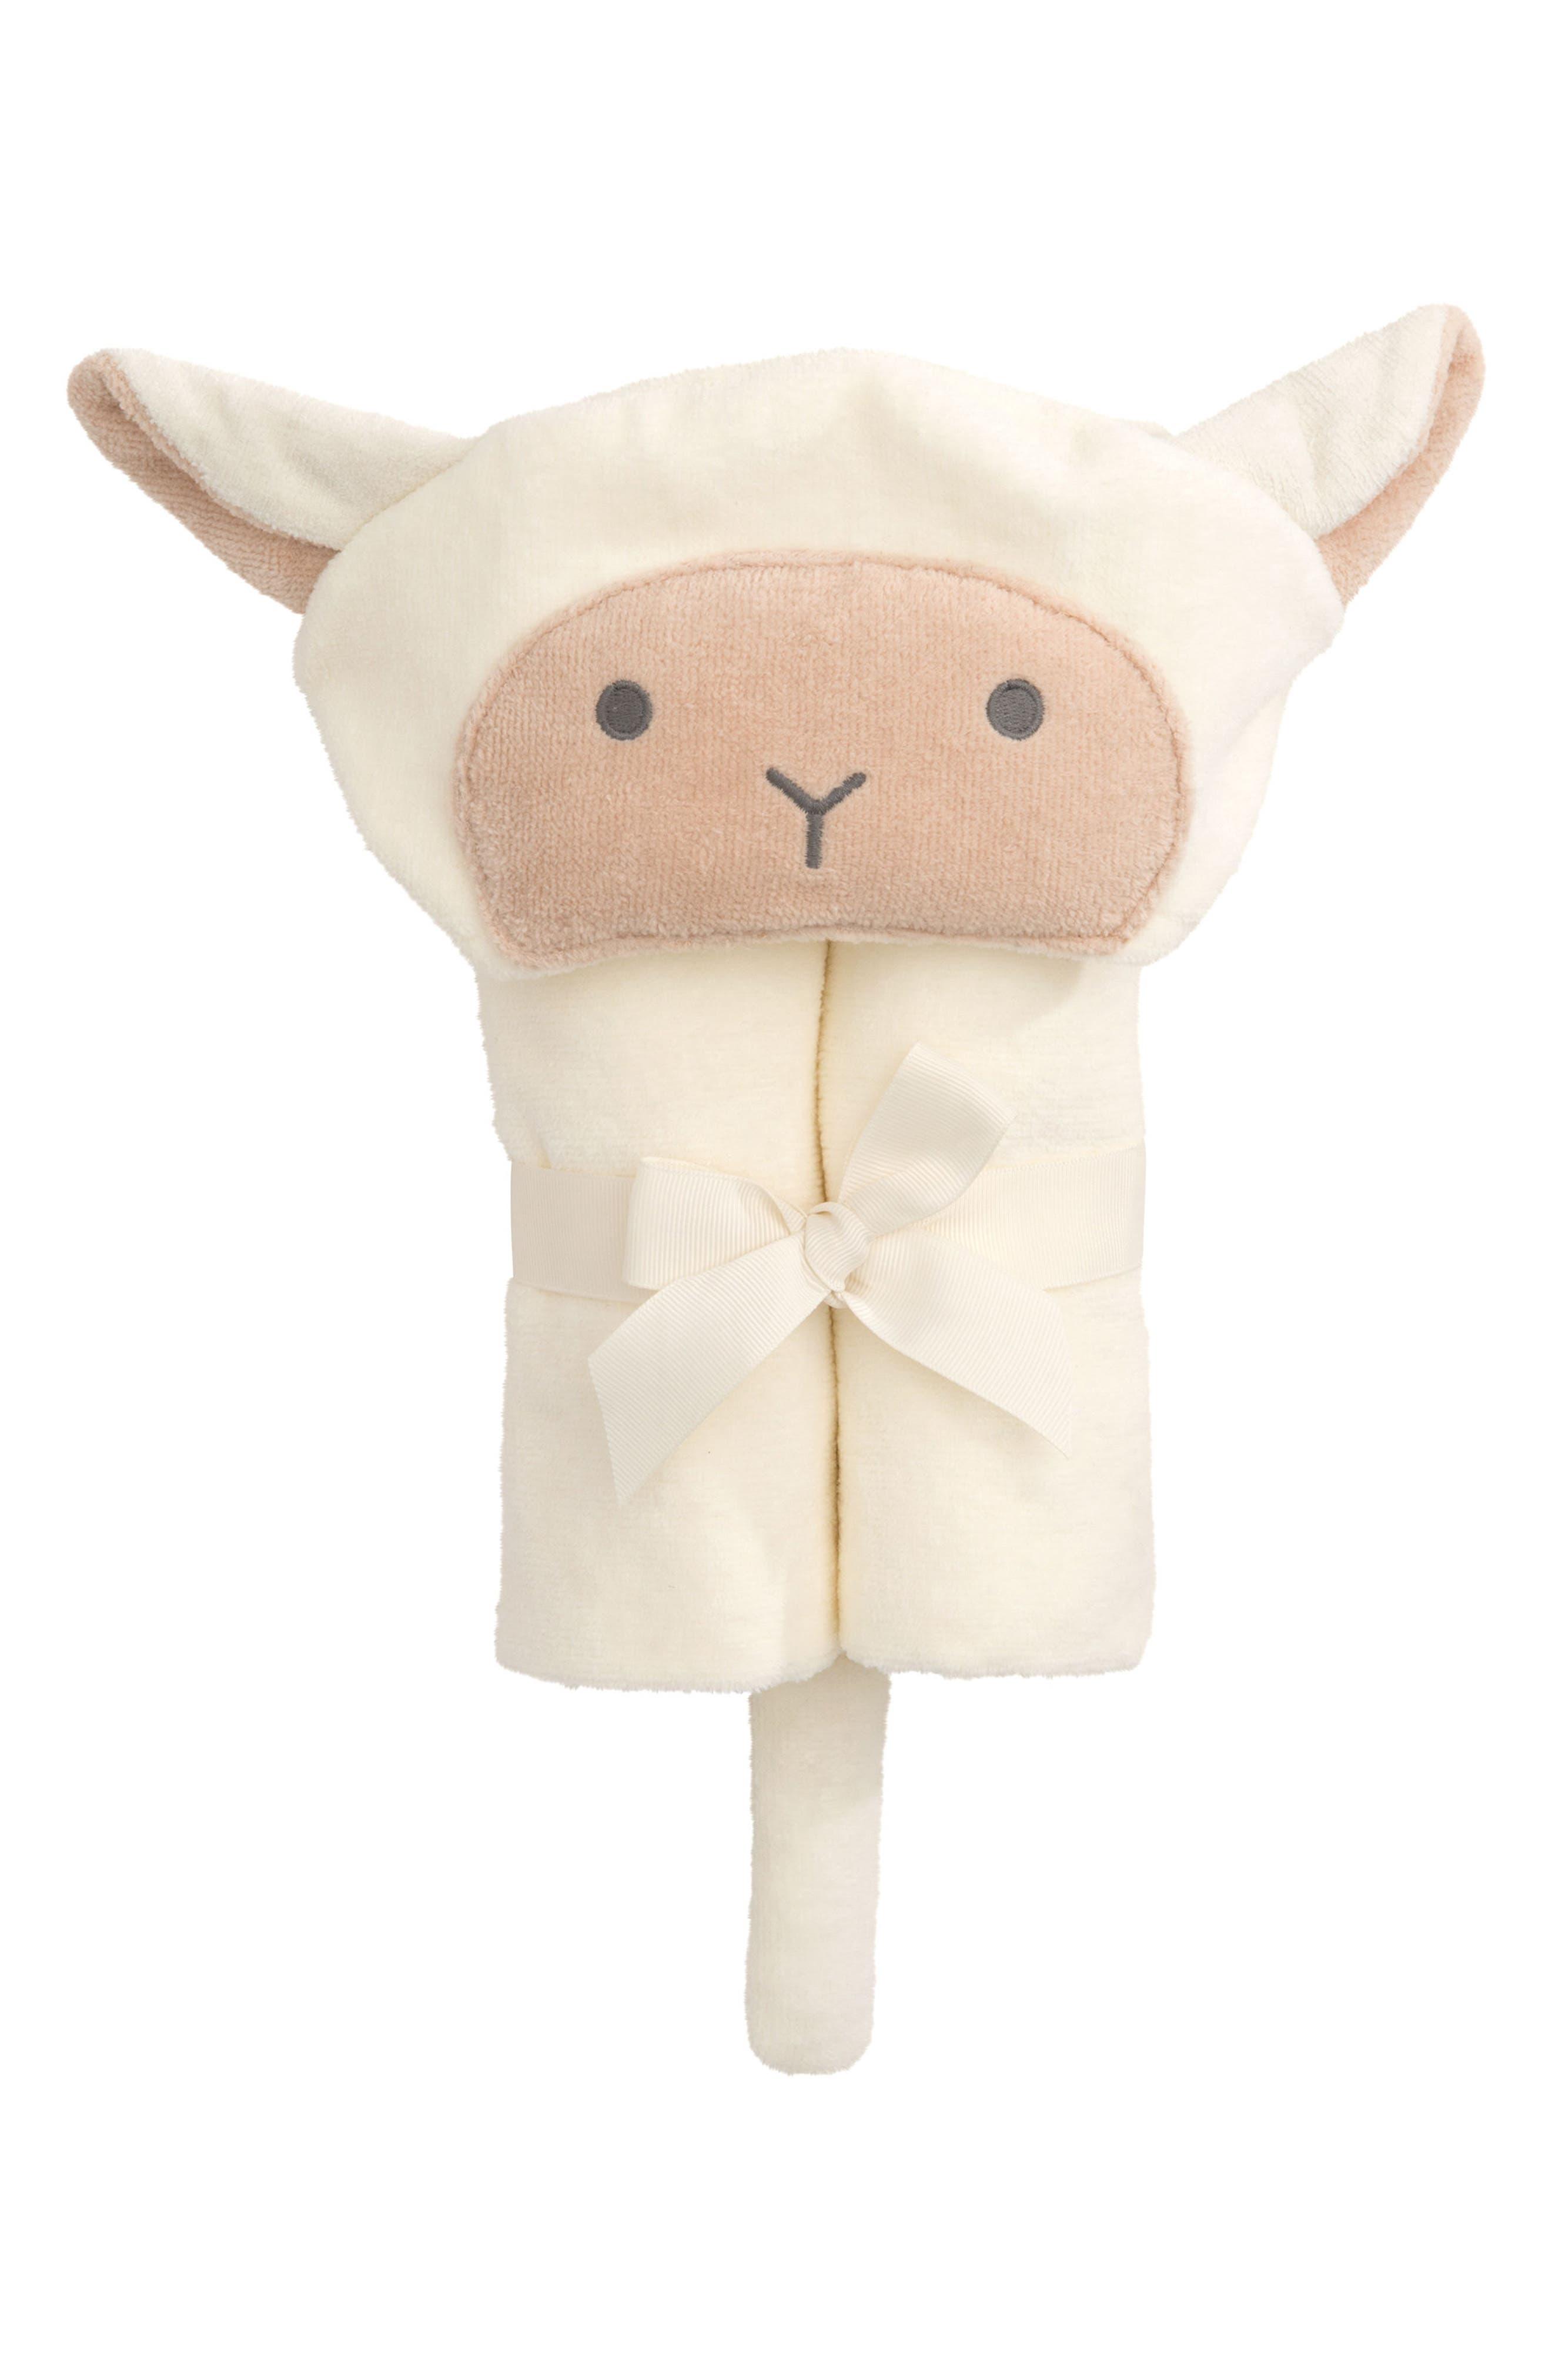 Terry Velour Hooded Lamb Towel,                             Main thumbnail 1, color,                             100